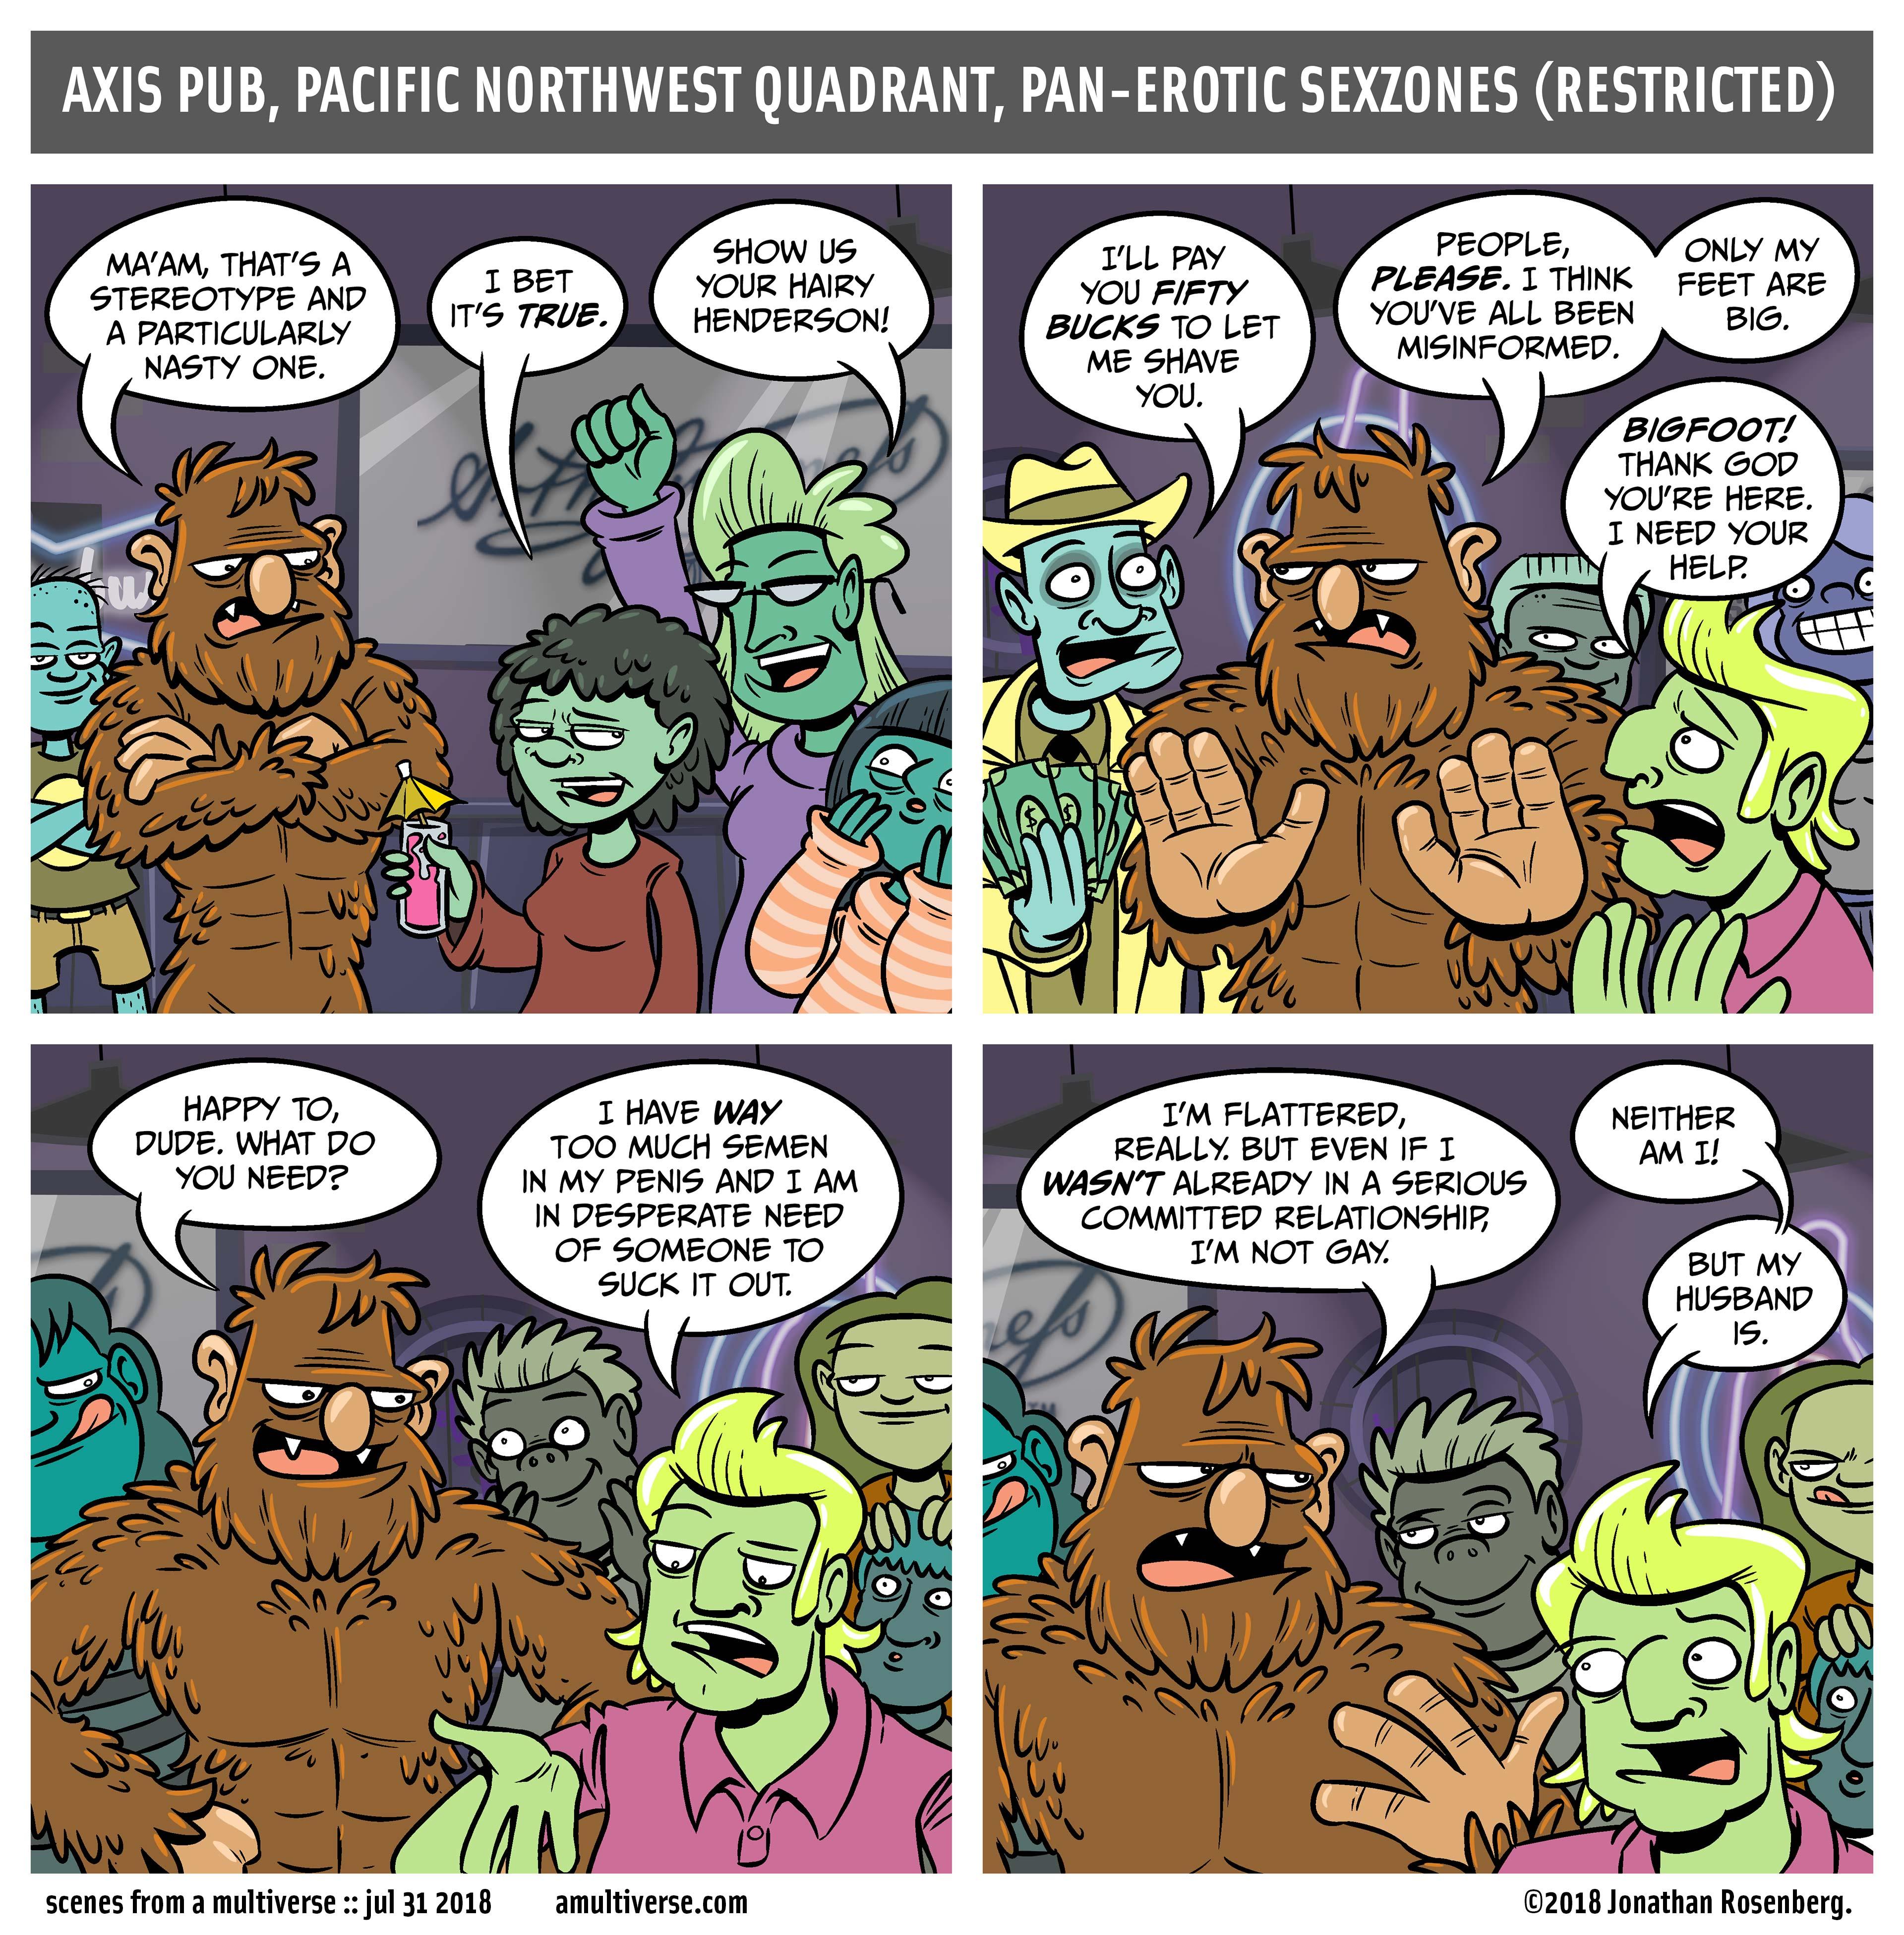 True Tales of Erotic Bigfoot